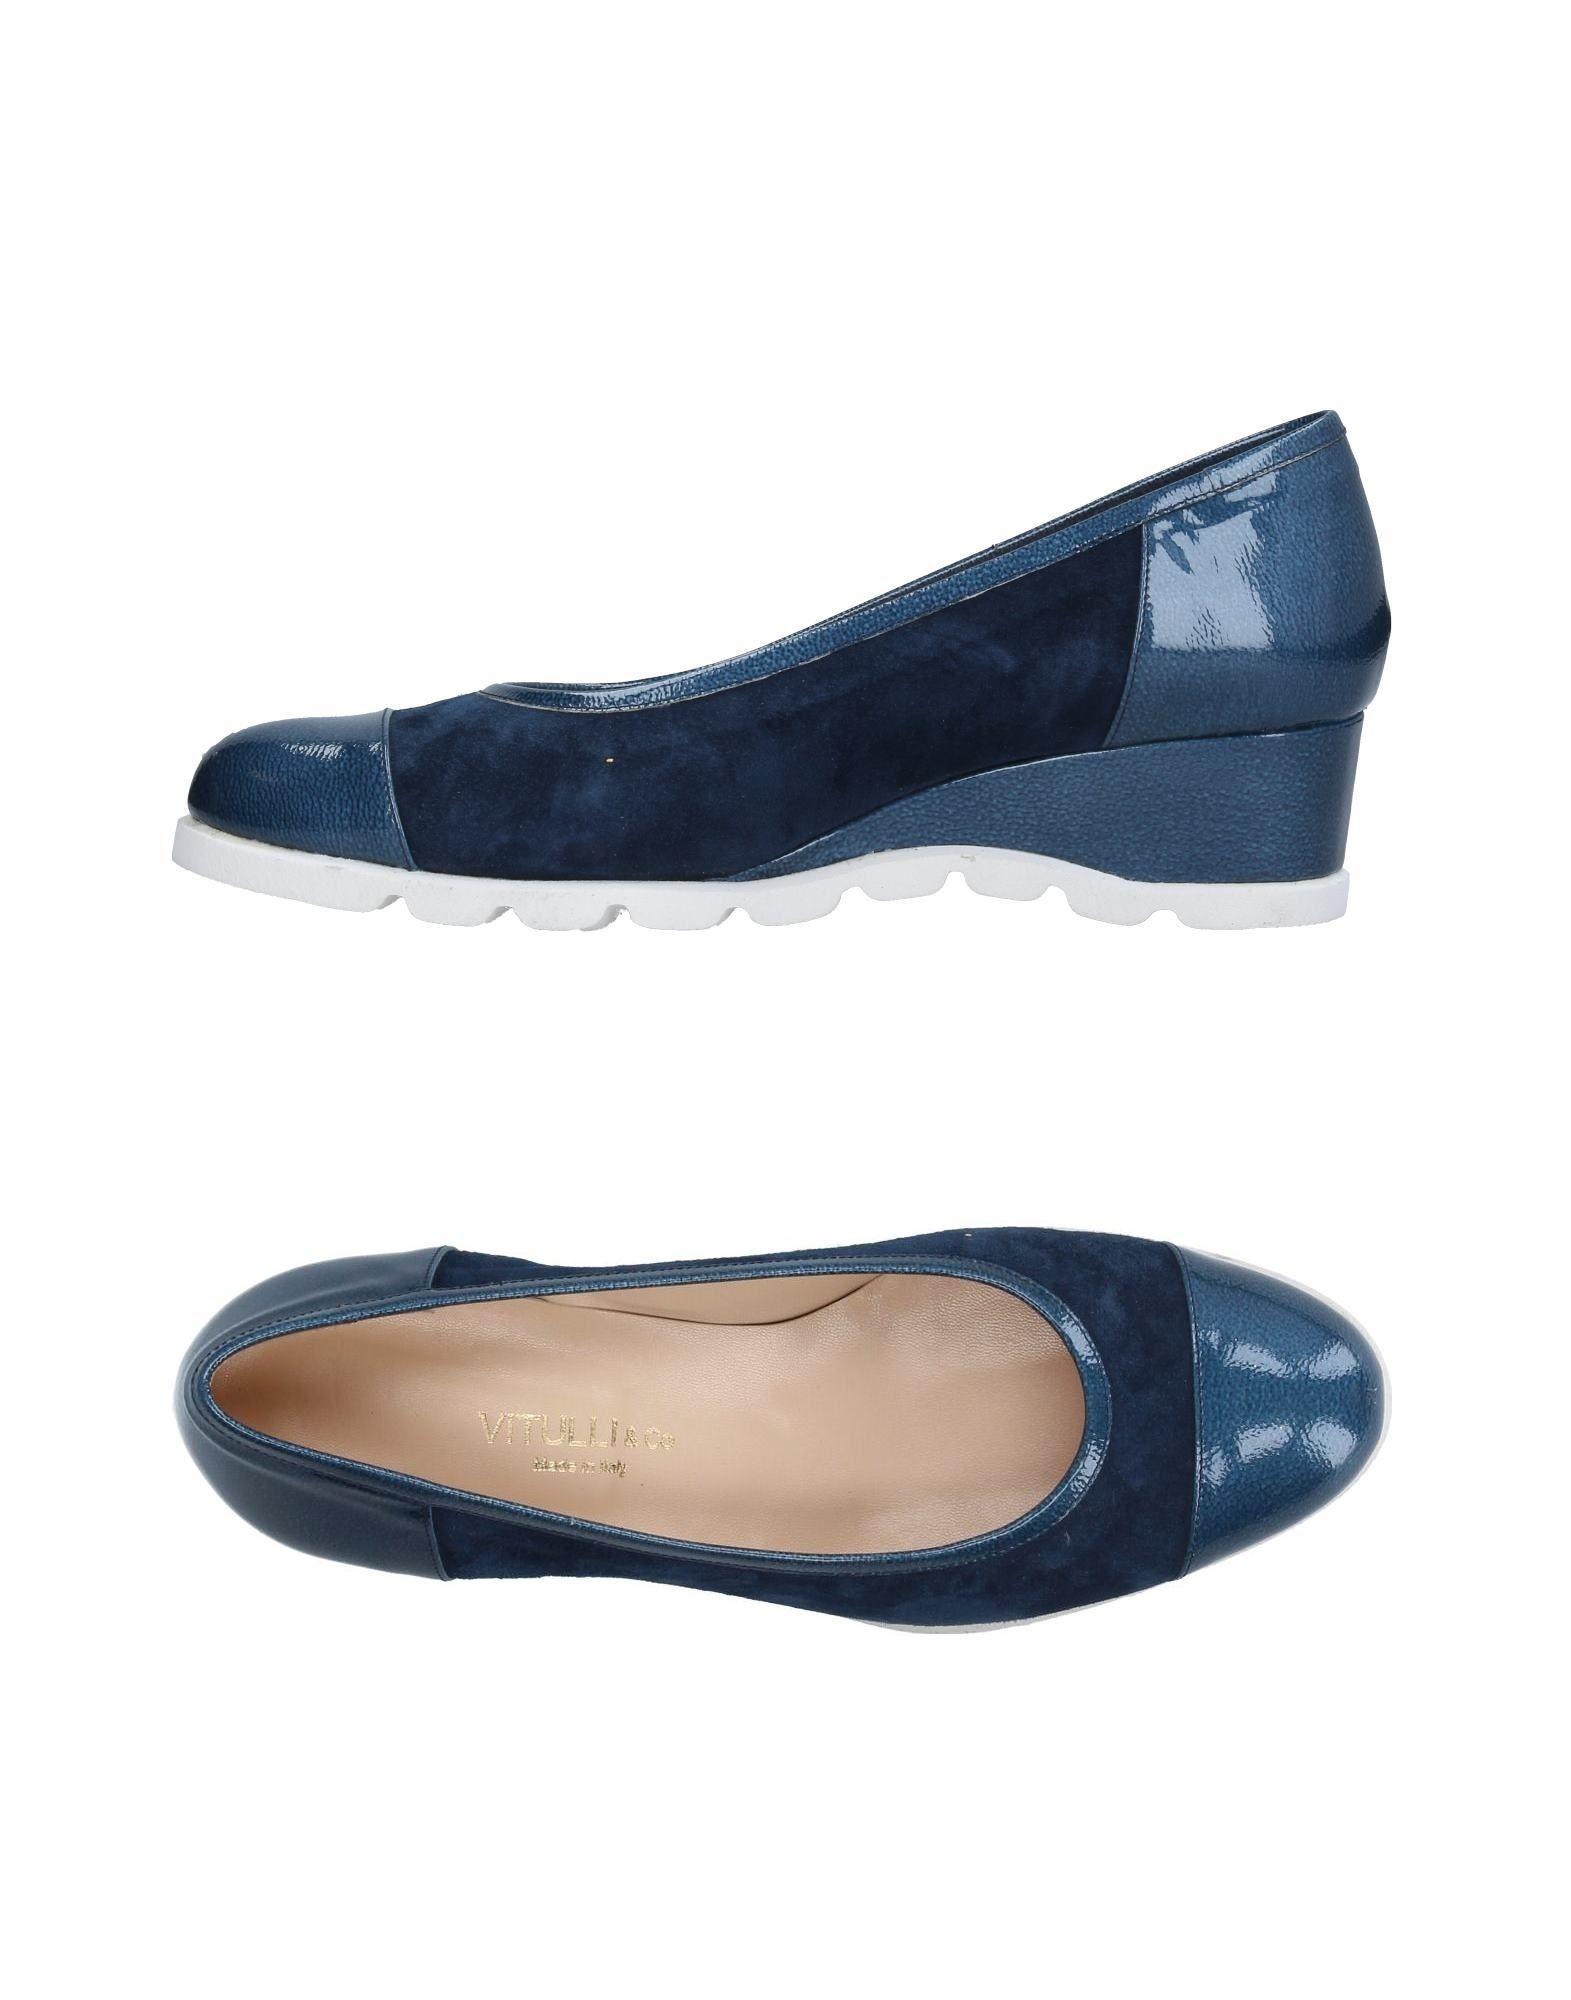 Escarpins vitulli & co. femme. bleu. 36.5 - 37...